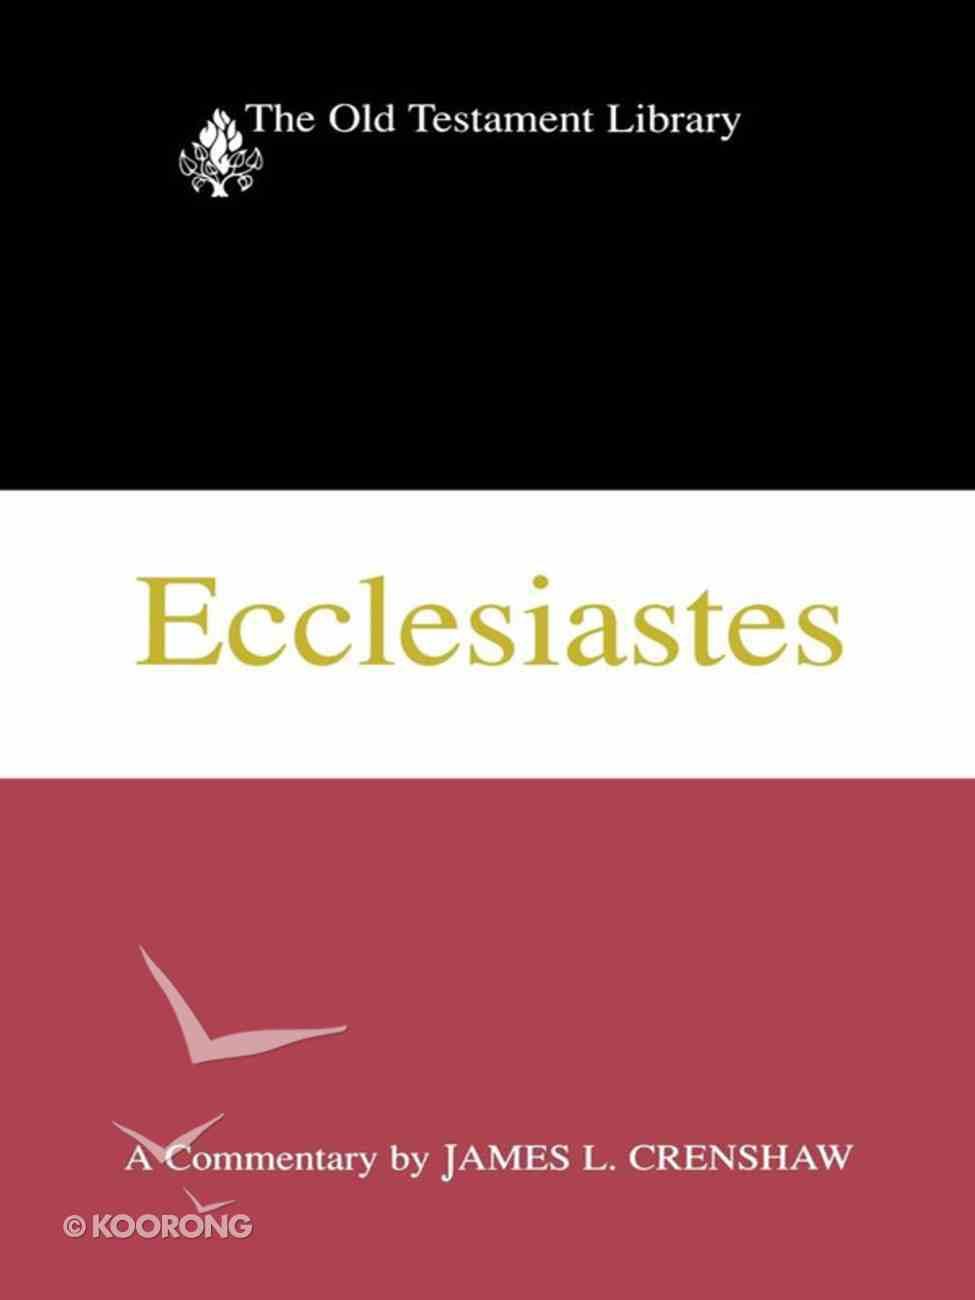 Ecclesiastes (1987) (Old Testament Library Series) eBook